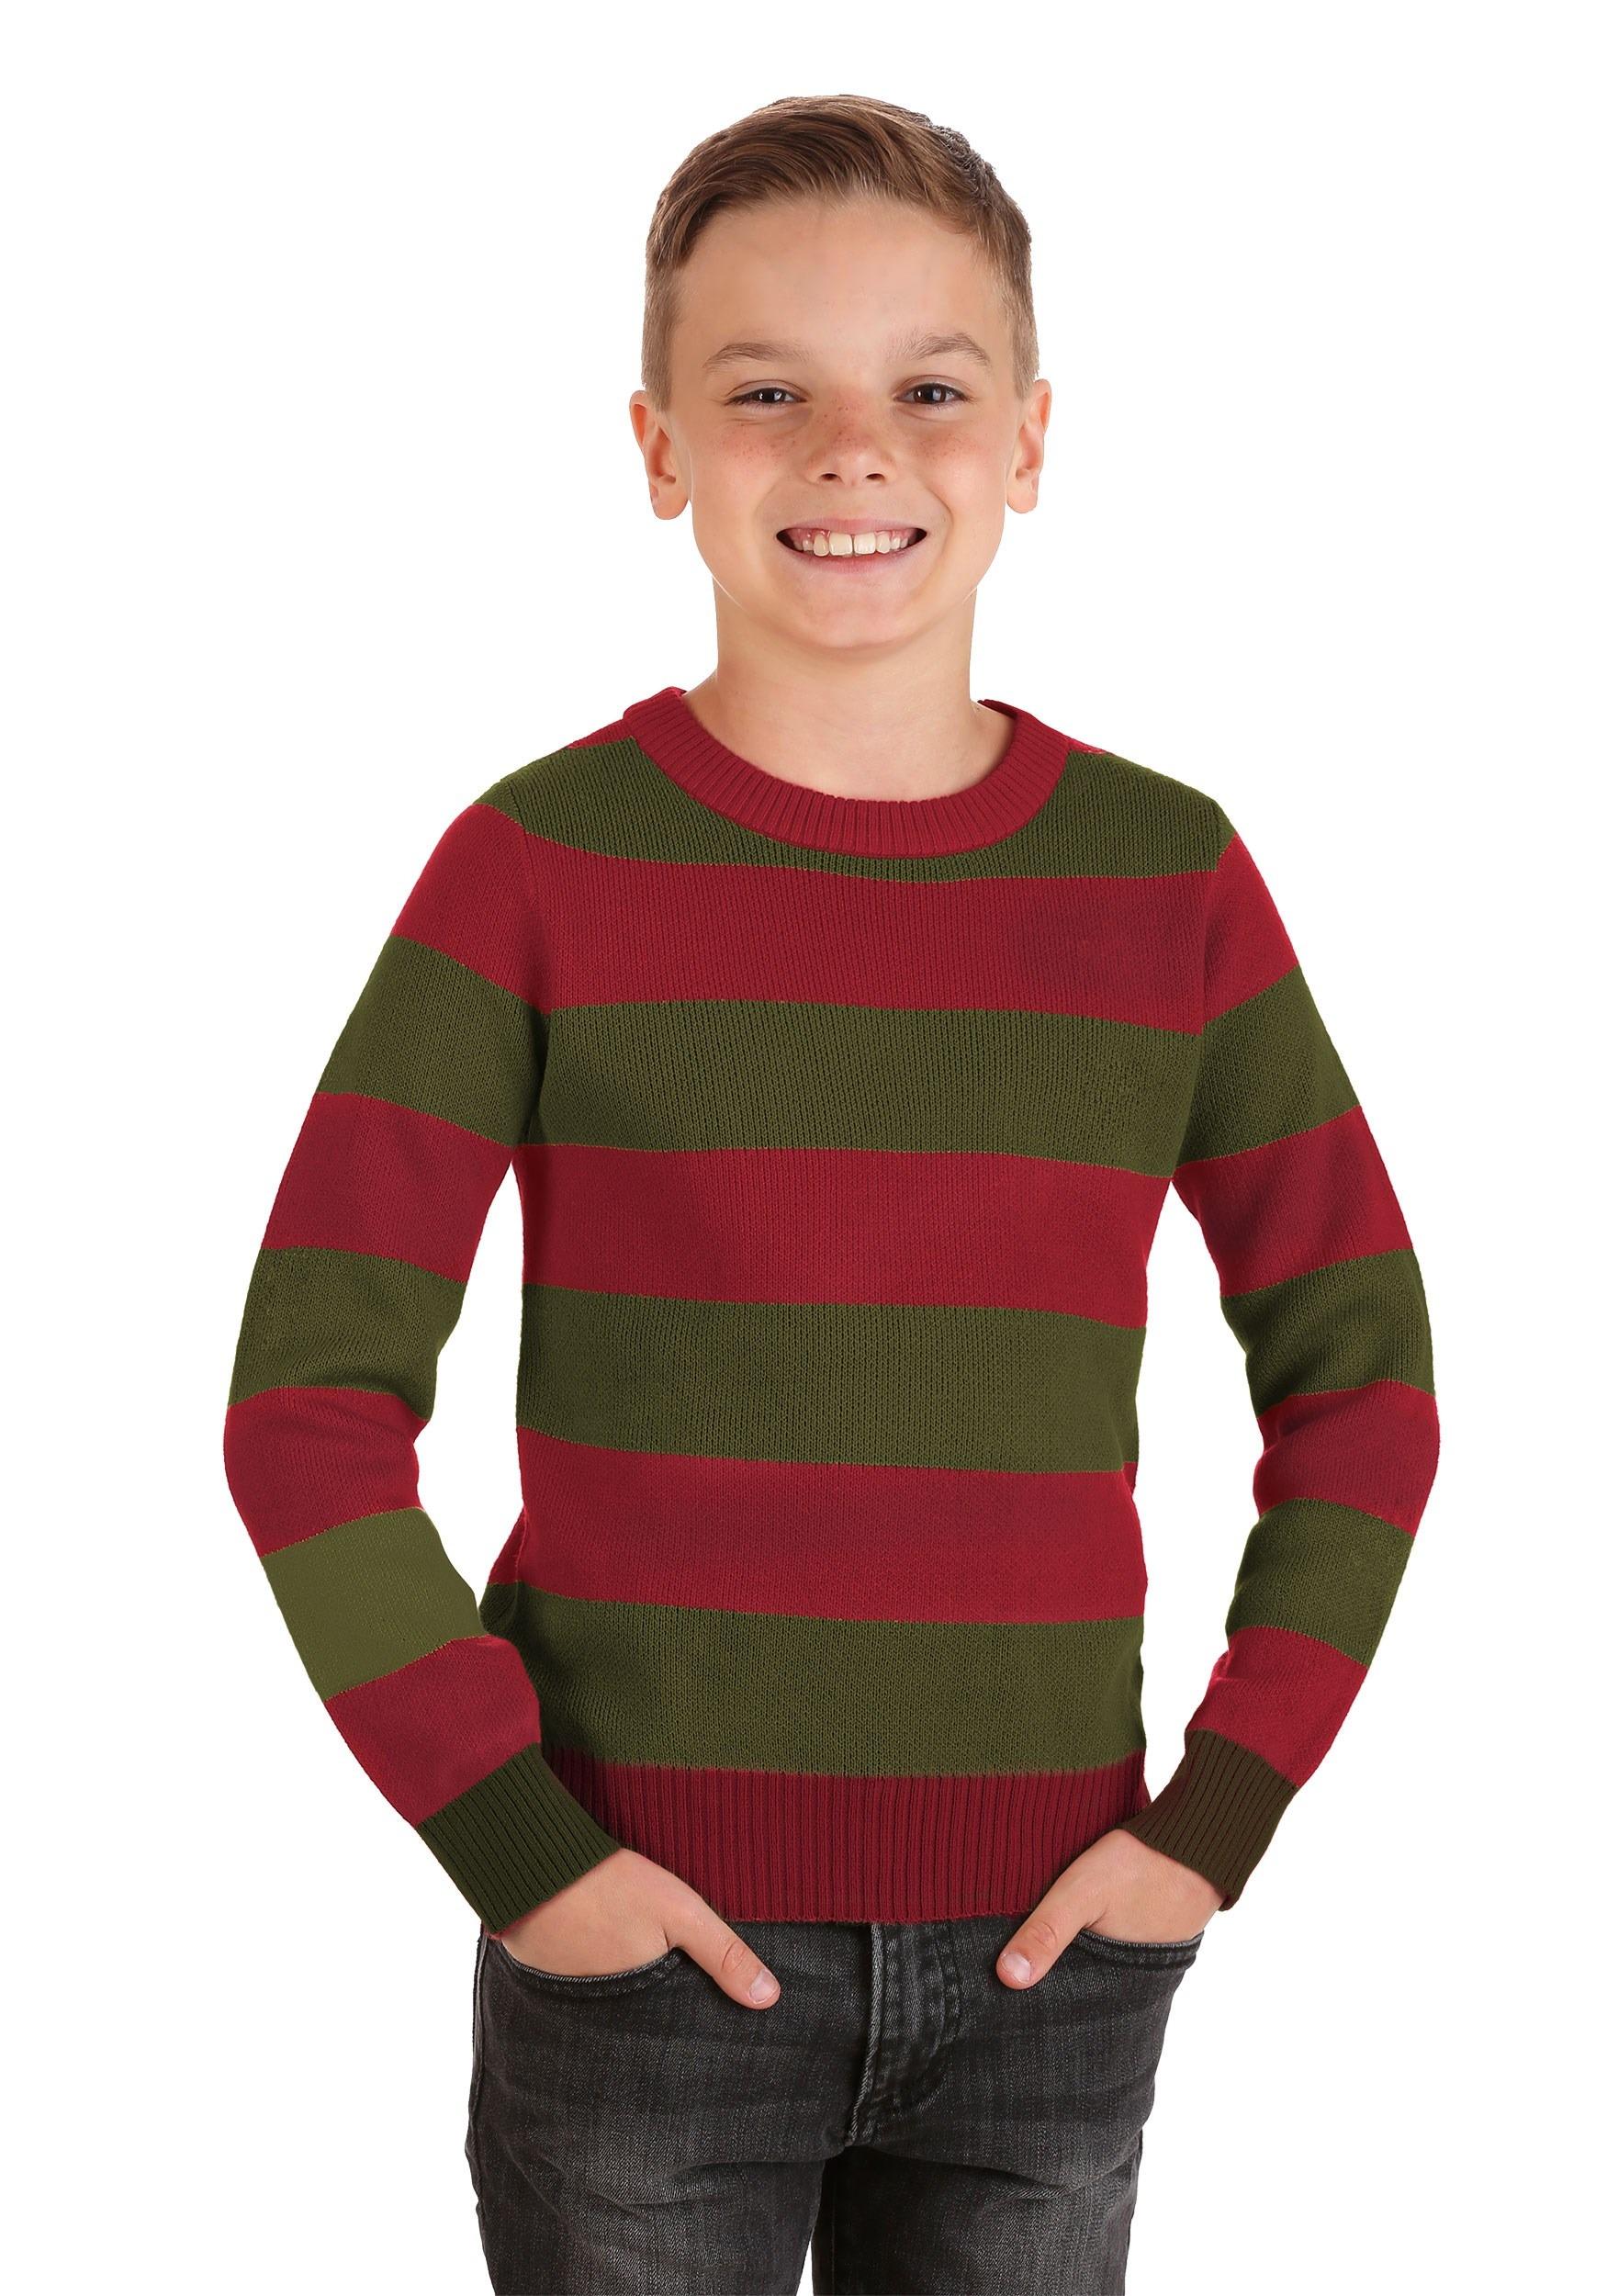 CHILD FREDDY KRUEGER CLAW HAT JUMPER NIGHTMARE ON ELM STREET HALLOWEEN COSTUME